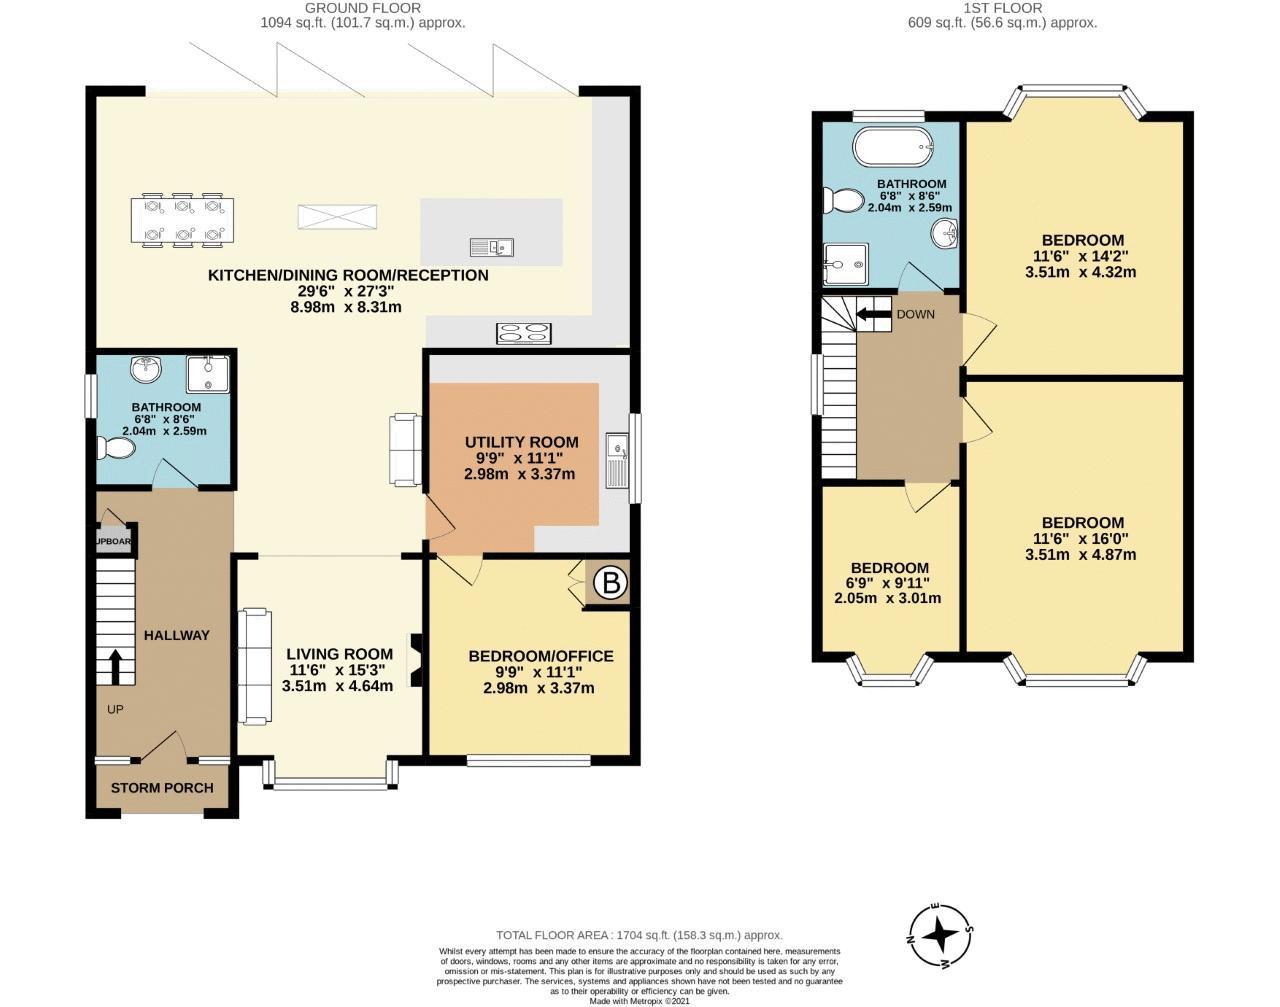 3 bedroom detached house SSTC in Sutton - floorplan 1.